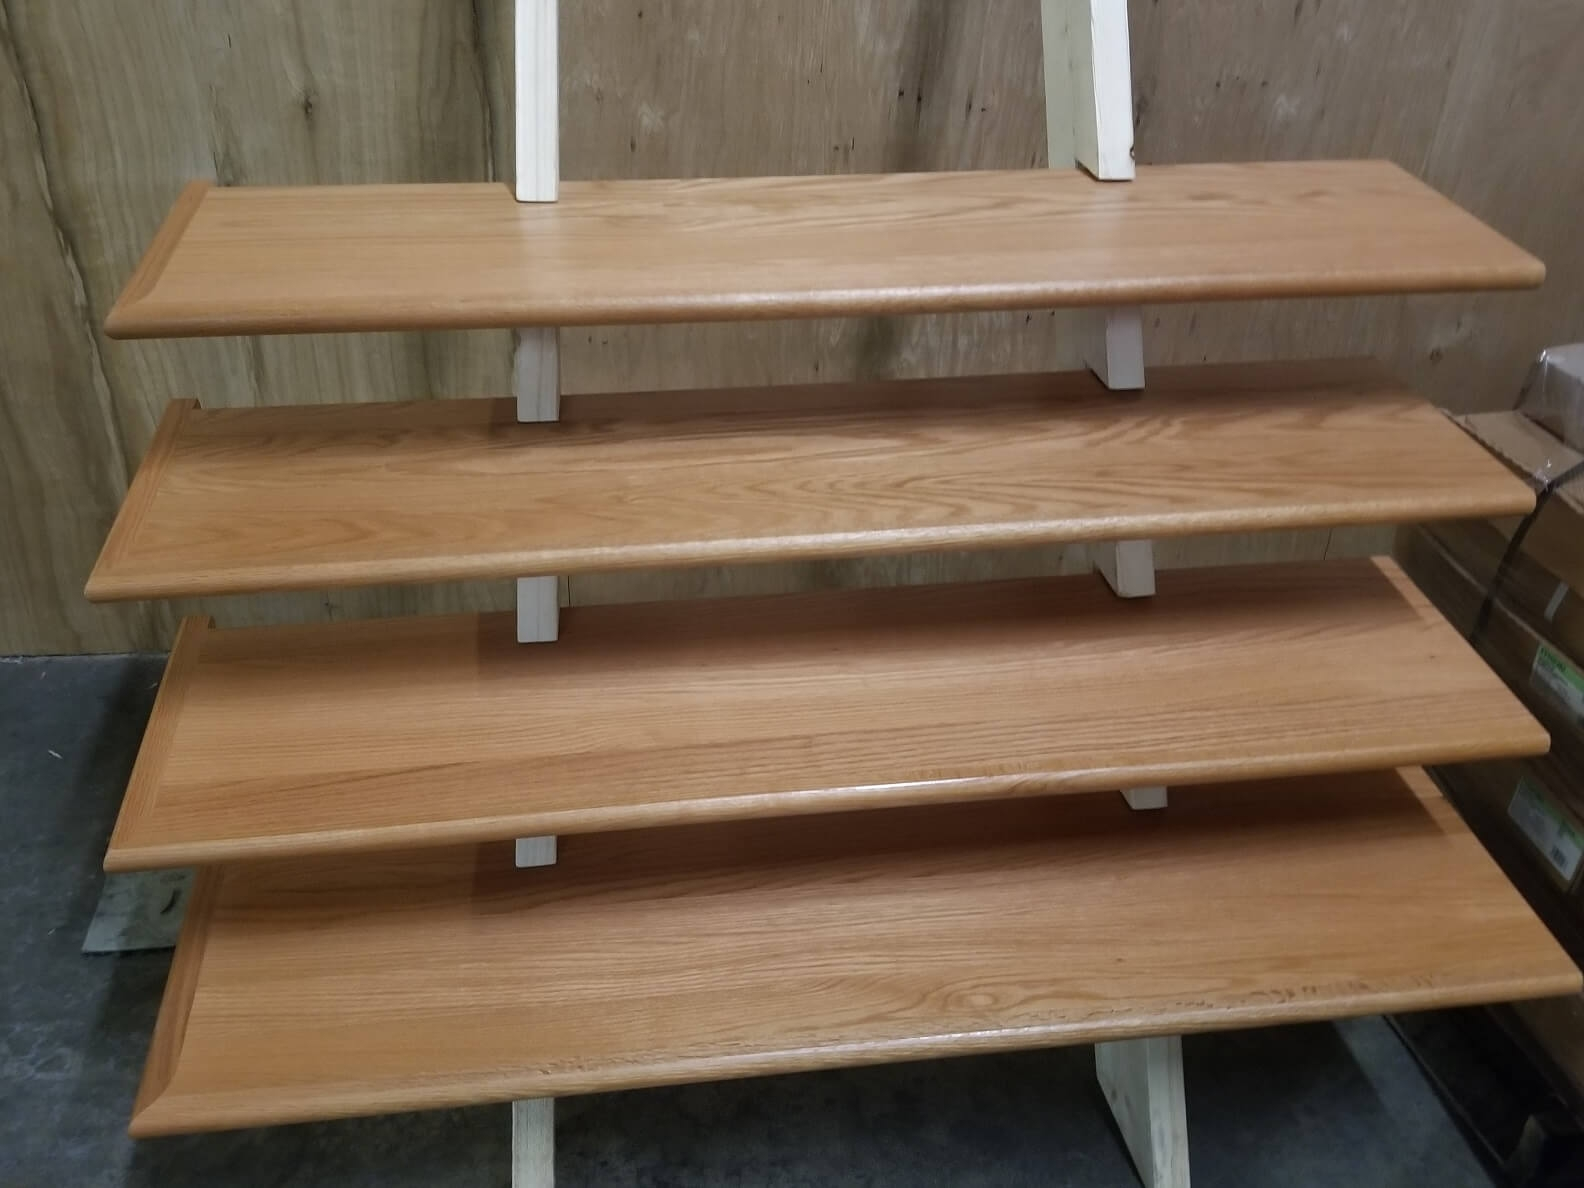 Stair Tread With Return Discount Hardwood Flooring At | Hardwood Floor Stair Treads | Wooden | Hand Scraped | Redwood | Pergo Floor | Laminate Flooring